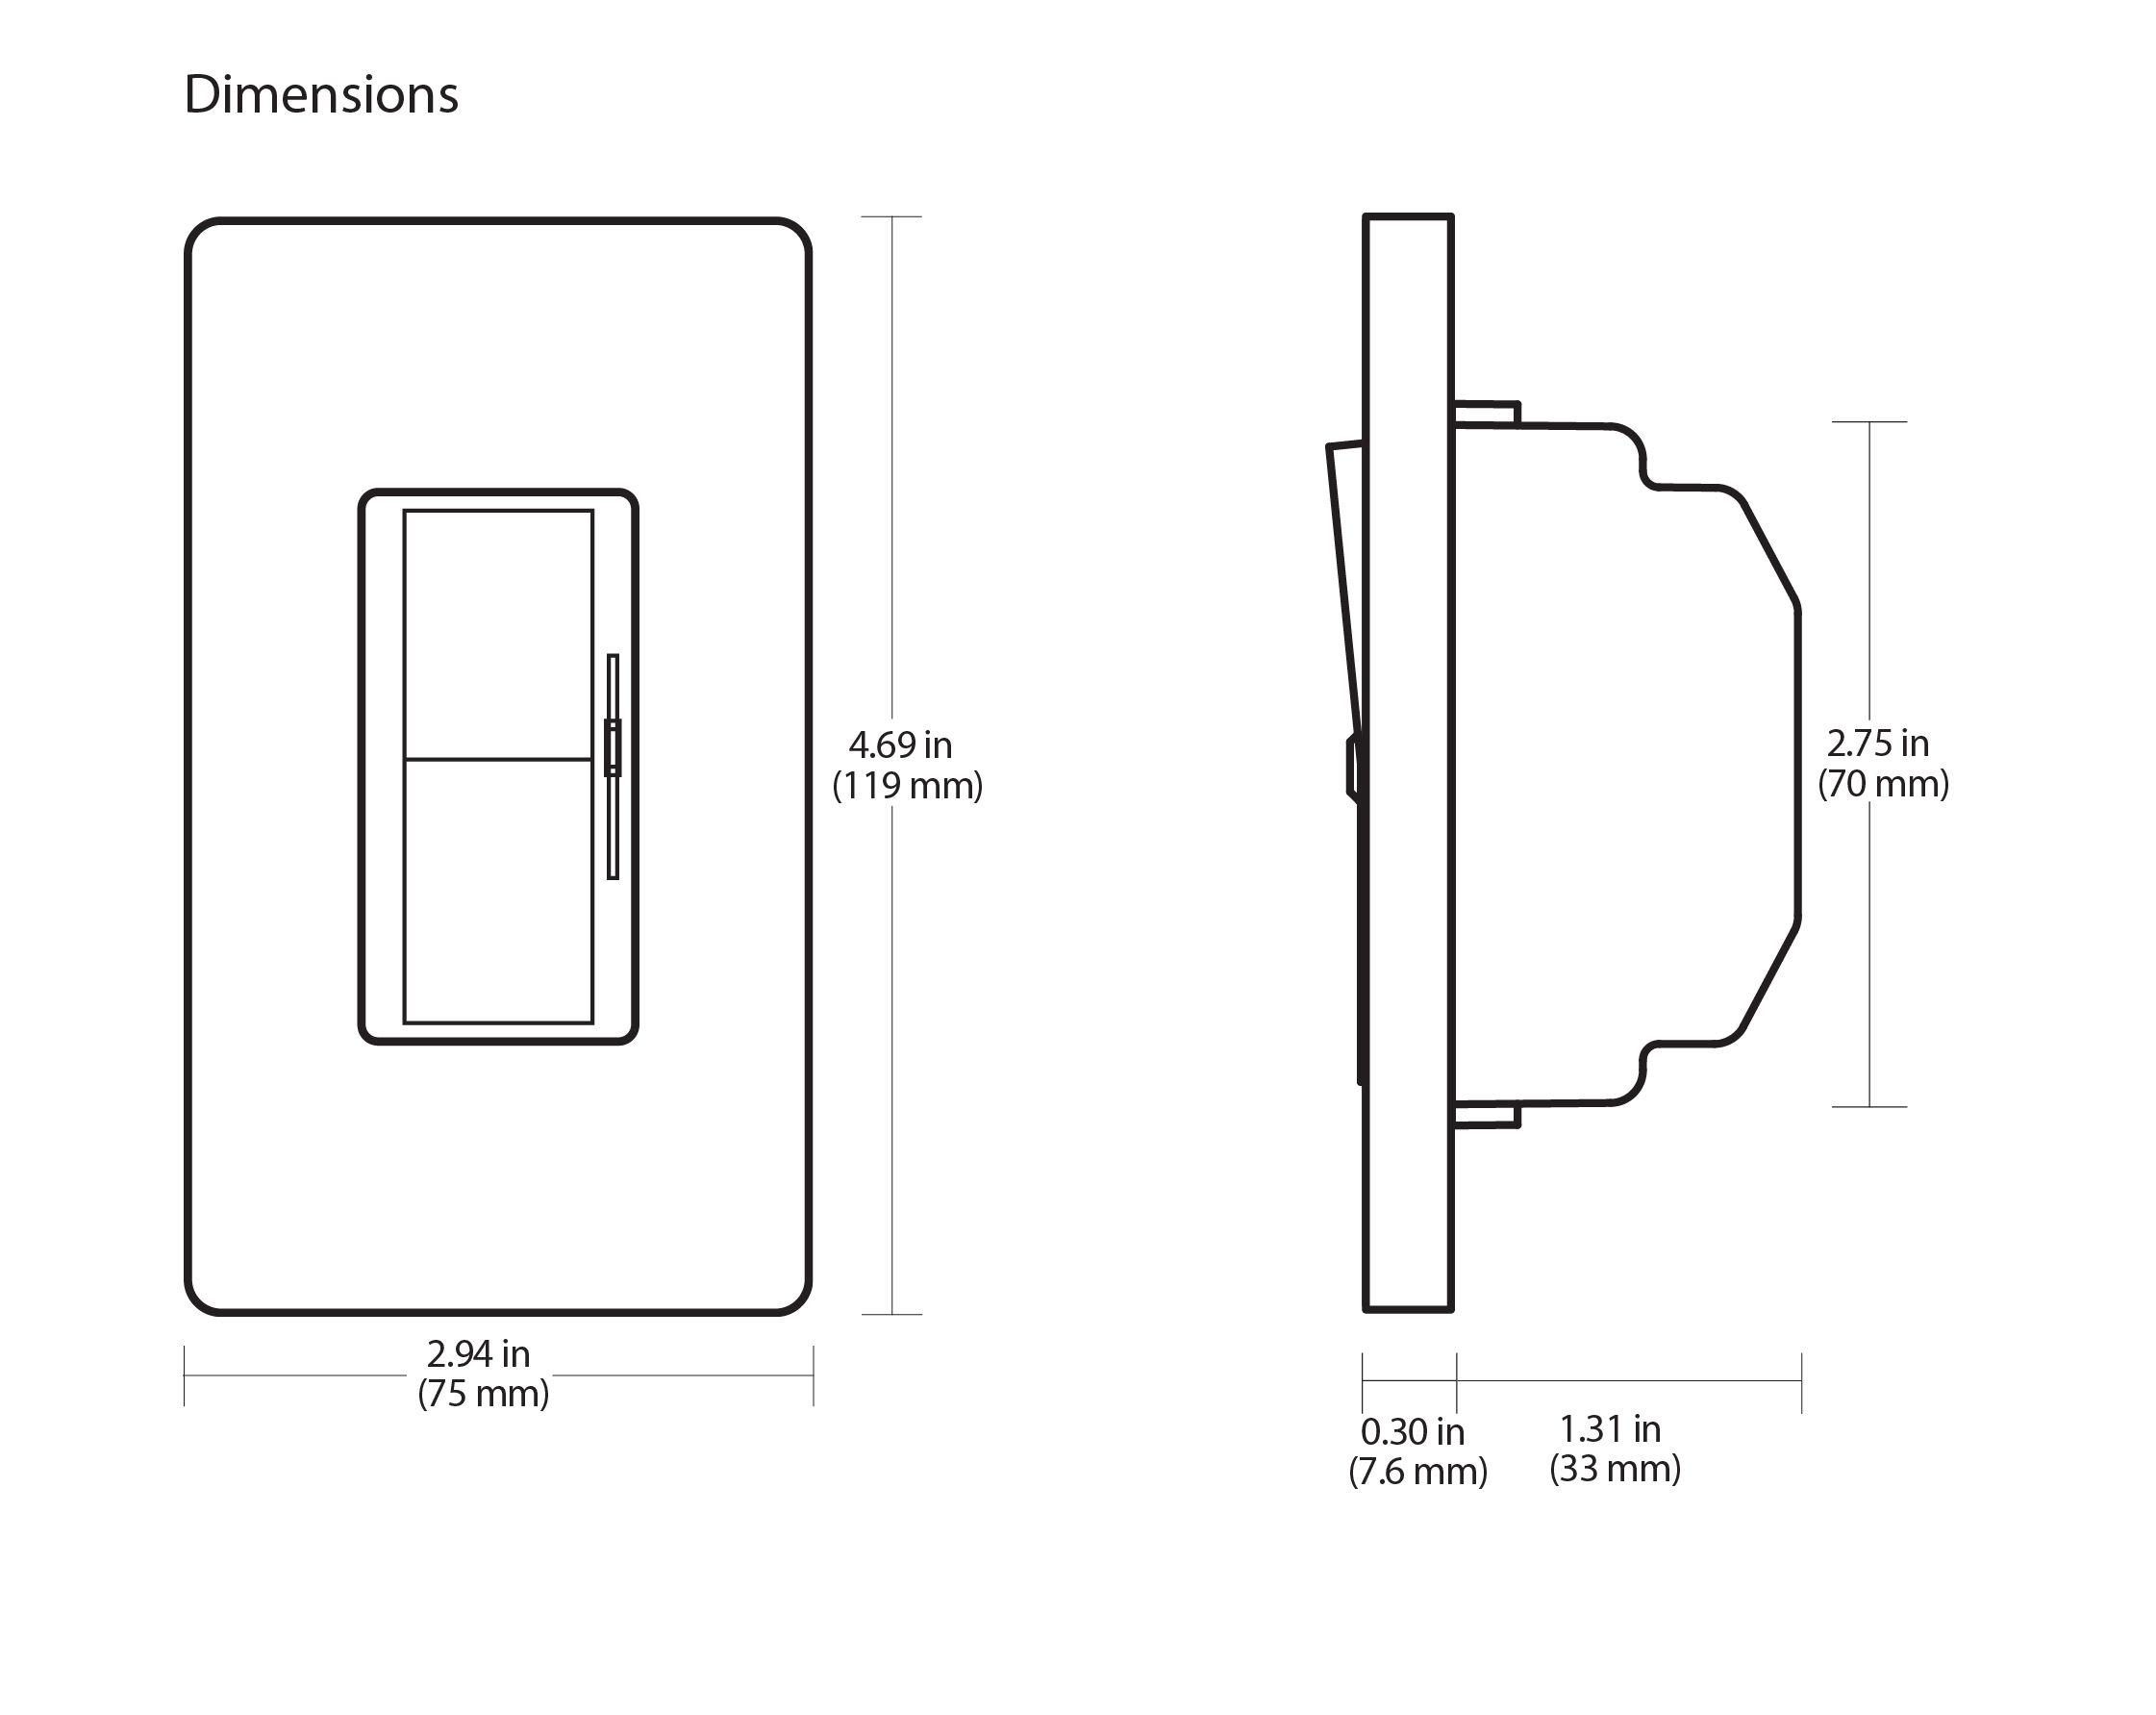 Lutron Diva Dvstv Wh 0 10v Dimmer Switch Single Pole 3